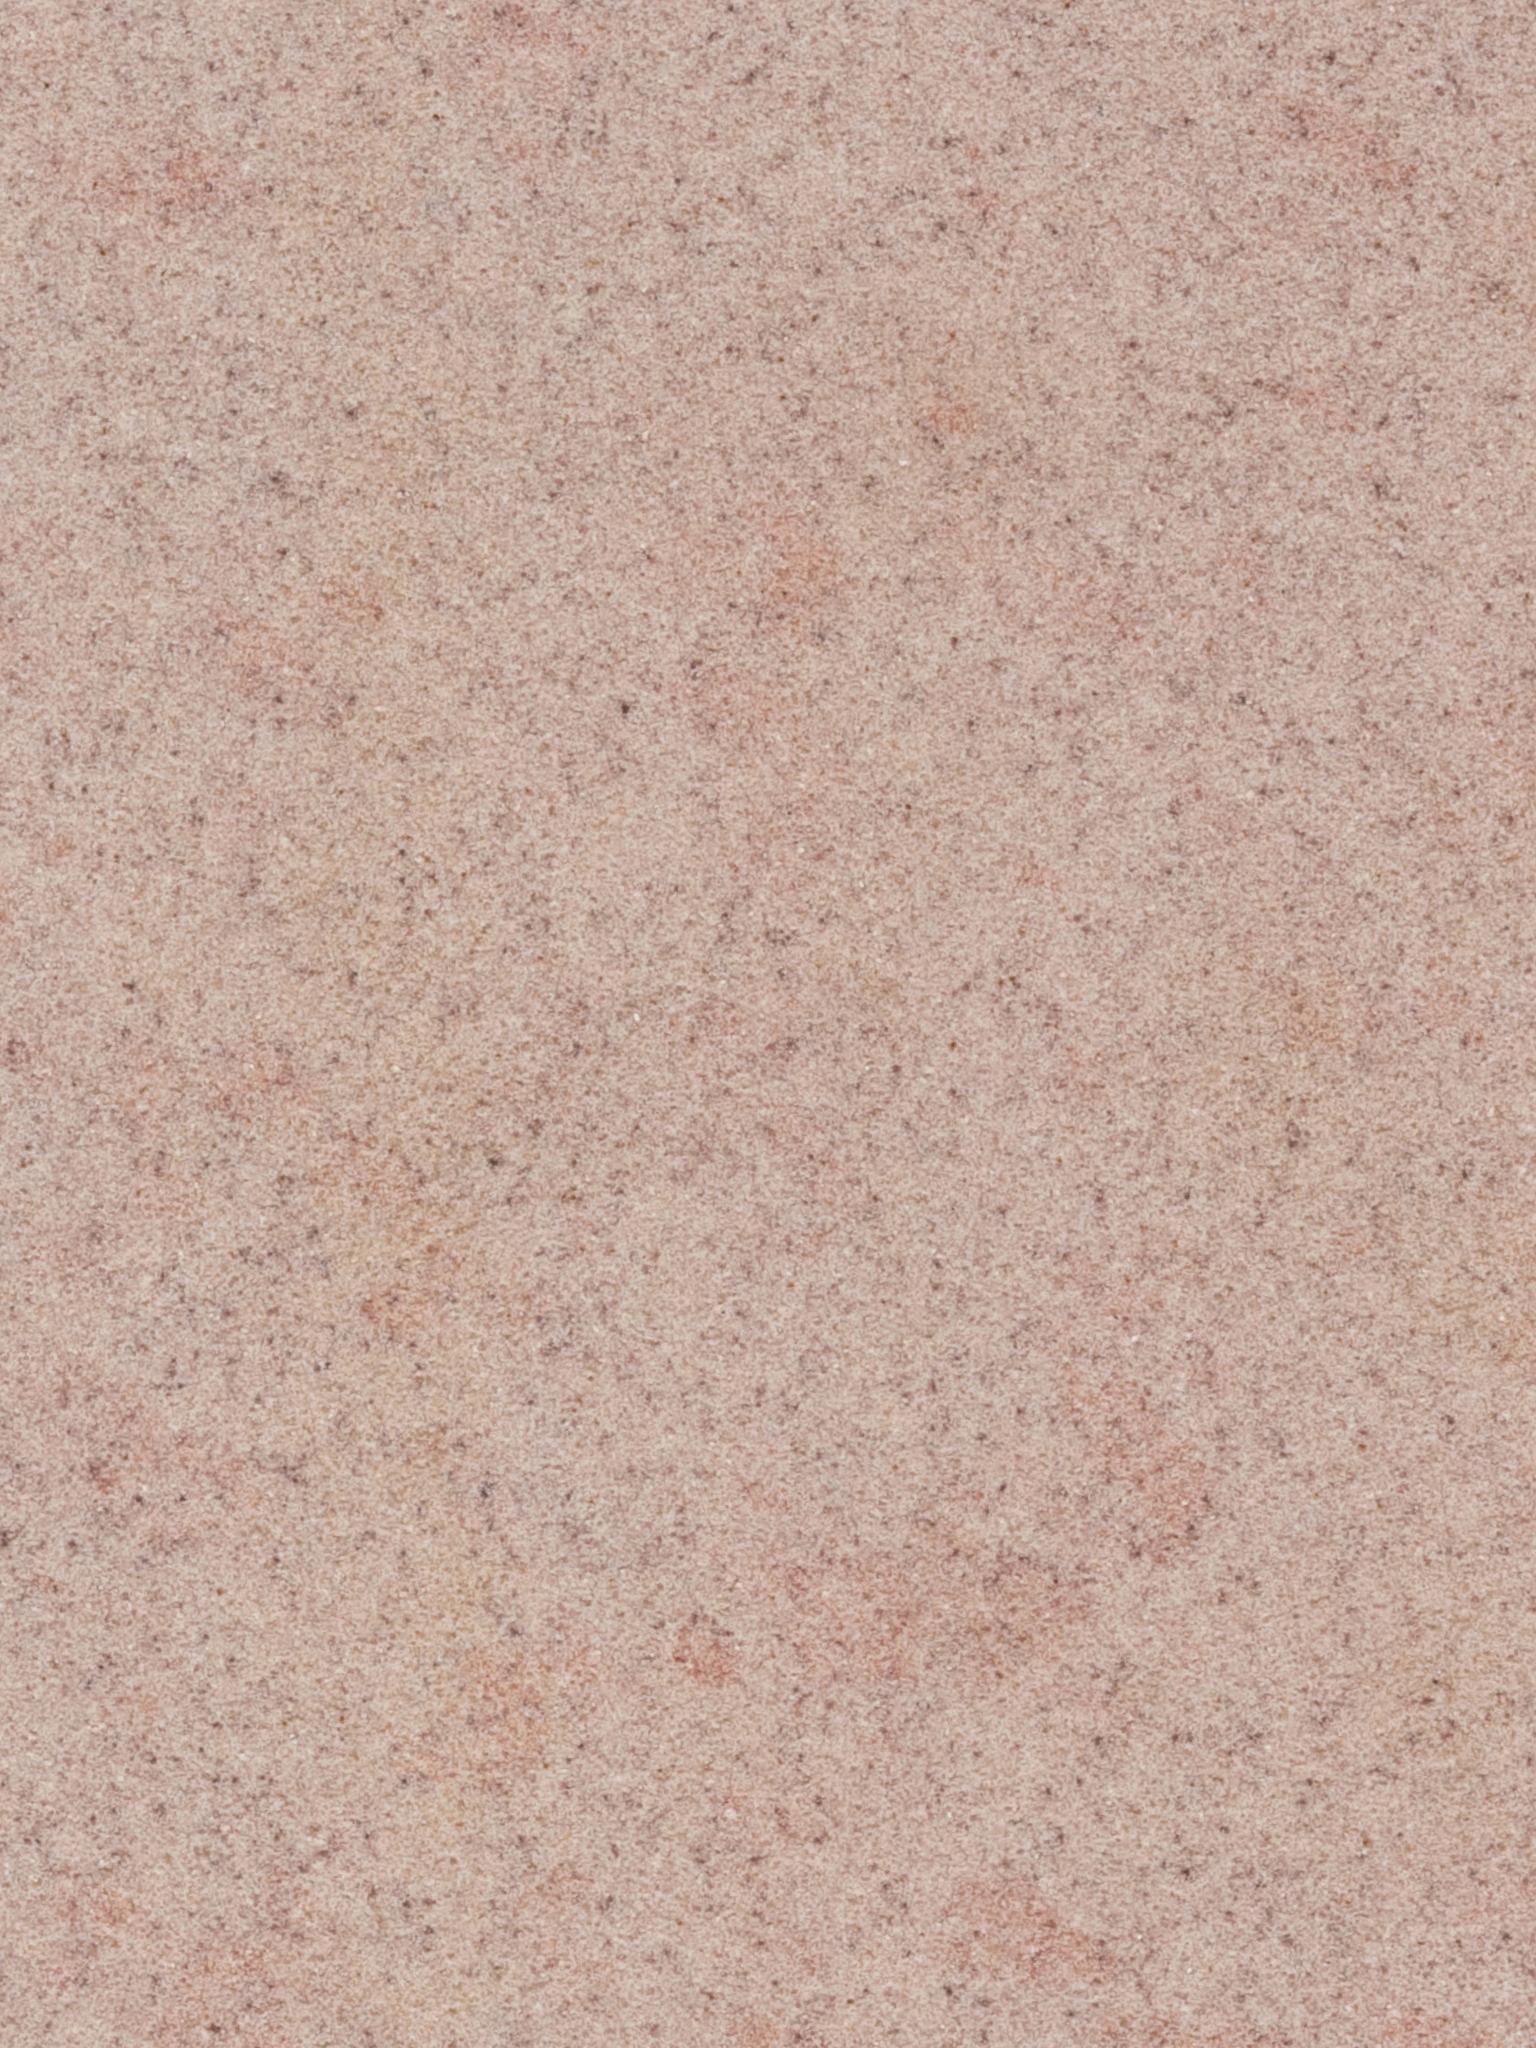 Doddington Pink Sandstone Suppliers Marshalls